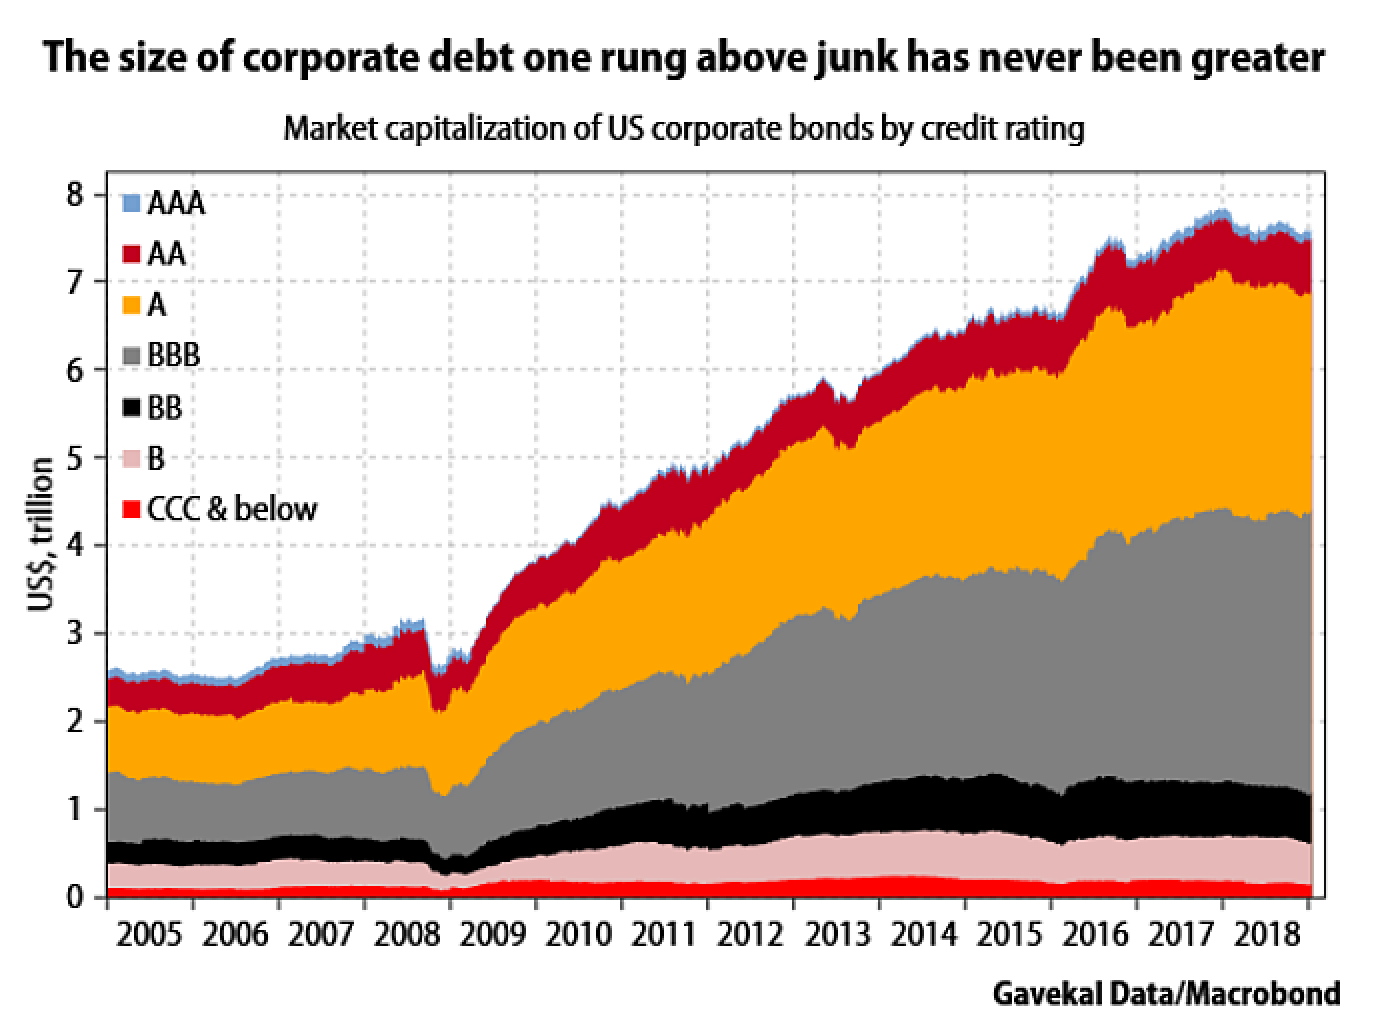 https://static.financialsense.com/styles/bli_orig_custom_user_screen_lg_min_2x/public/images/2019-01/bbb-corporate-bonds.png?itok=yhM3aDAv